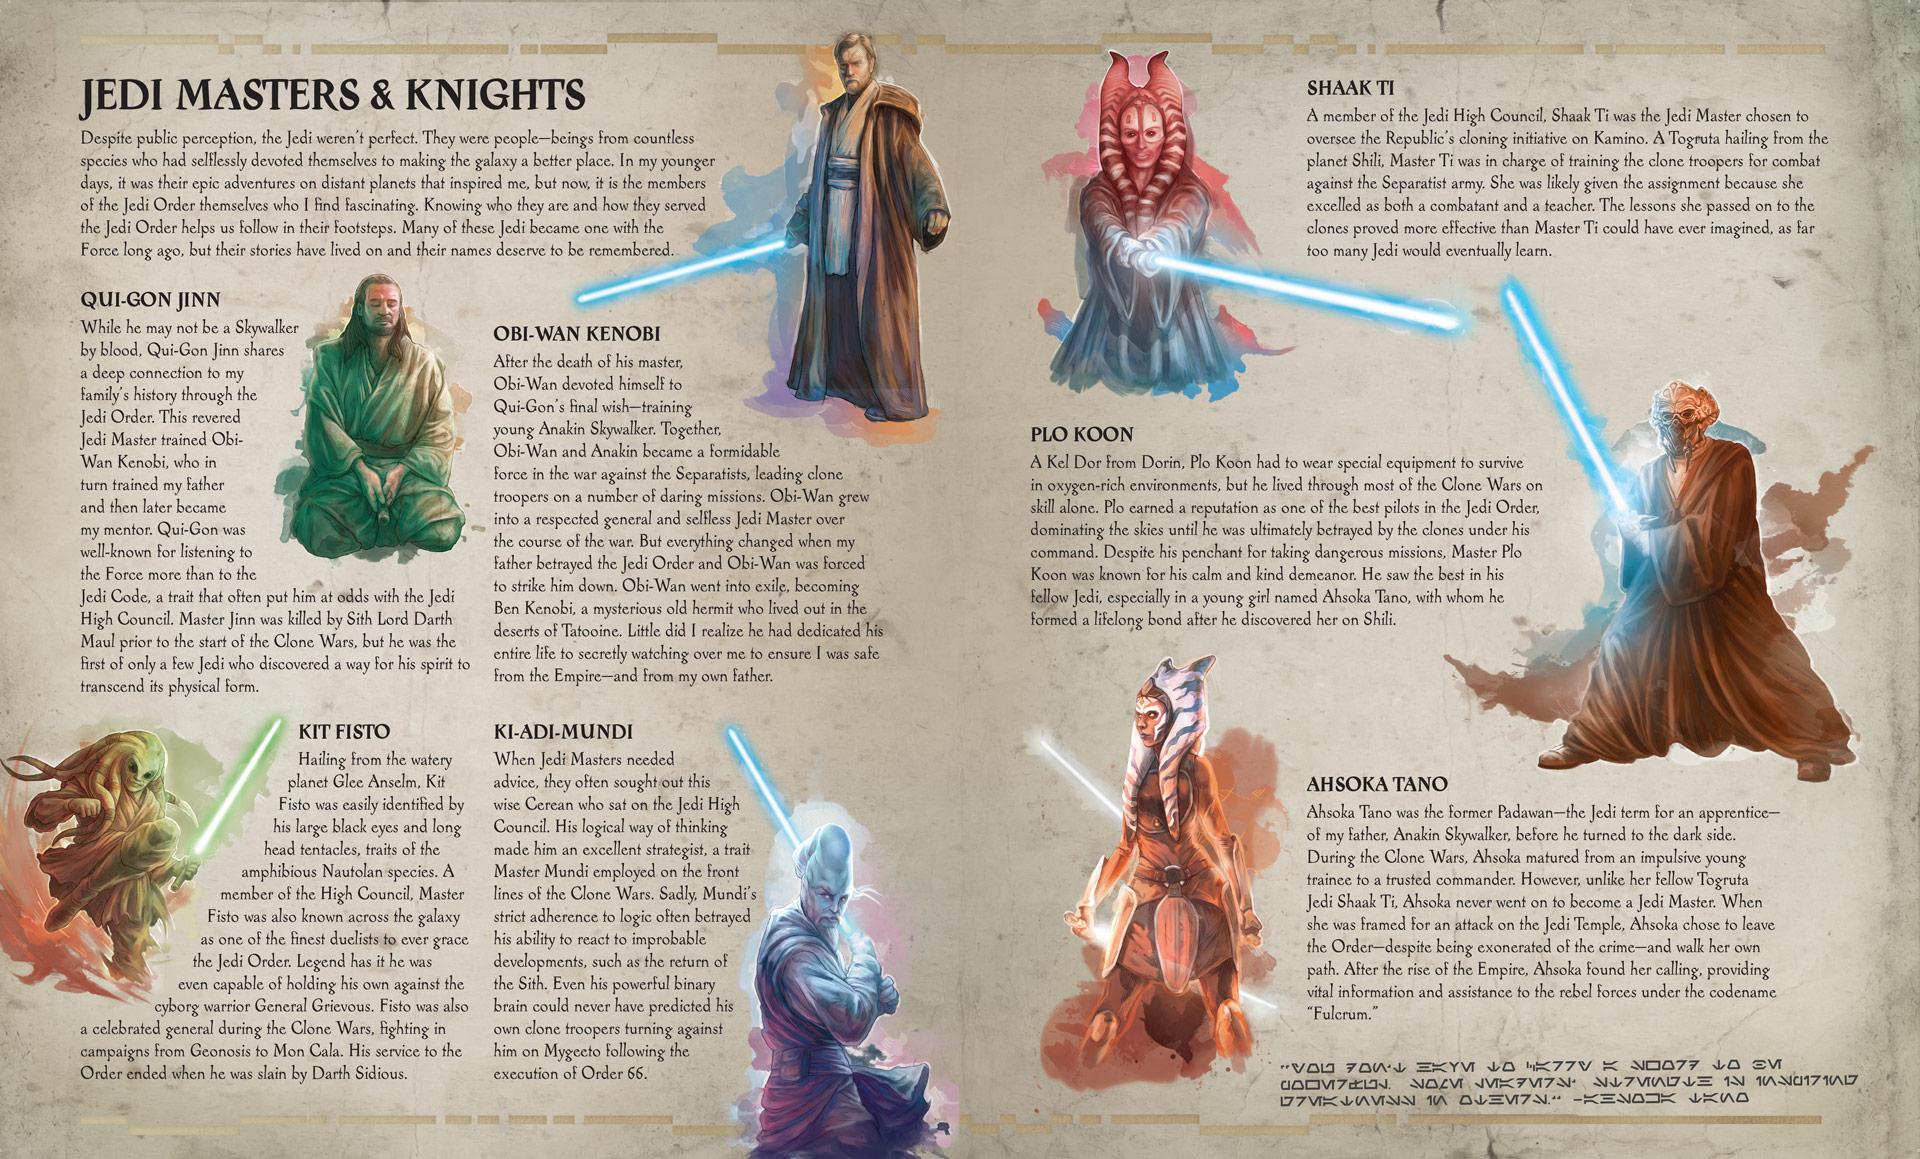 secrets-of-the-jedi-jedi-knights